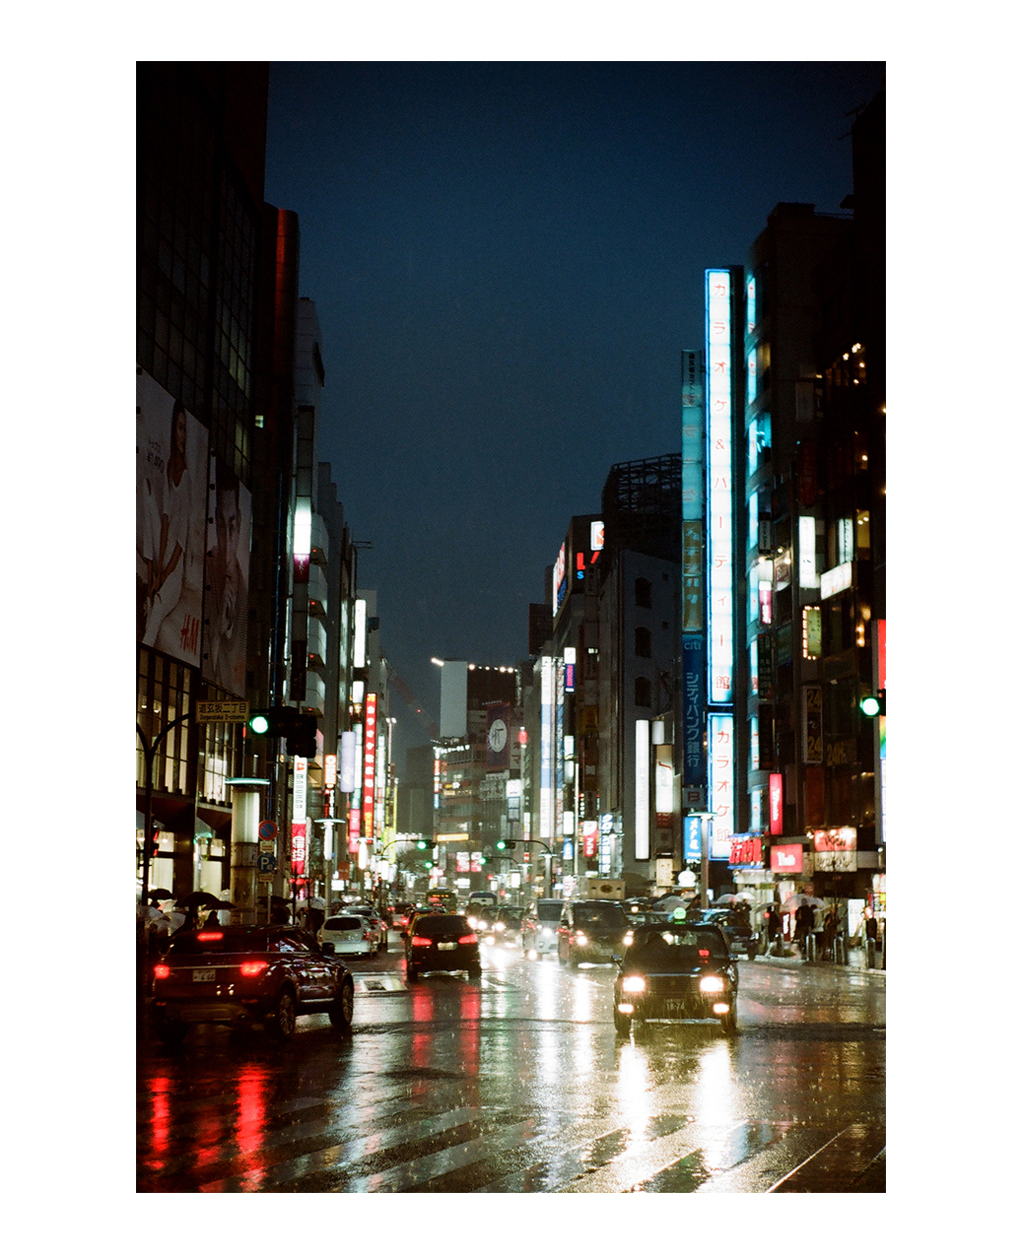 Shibuya at night, Tokyo.